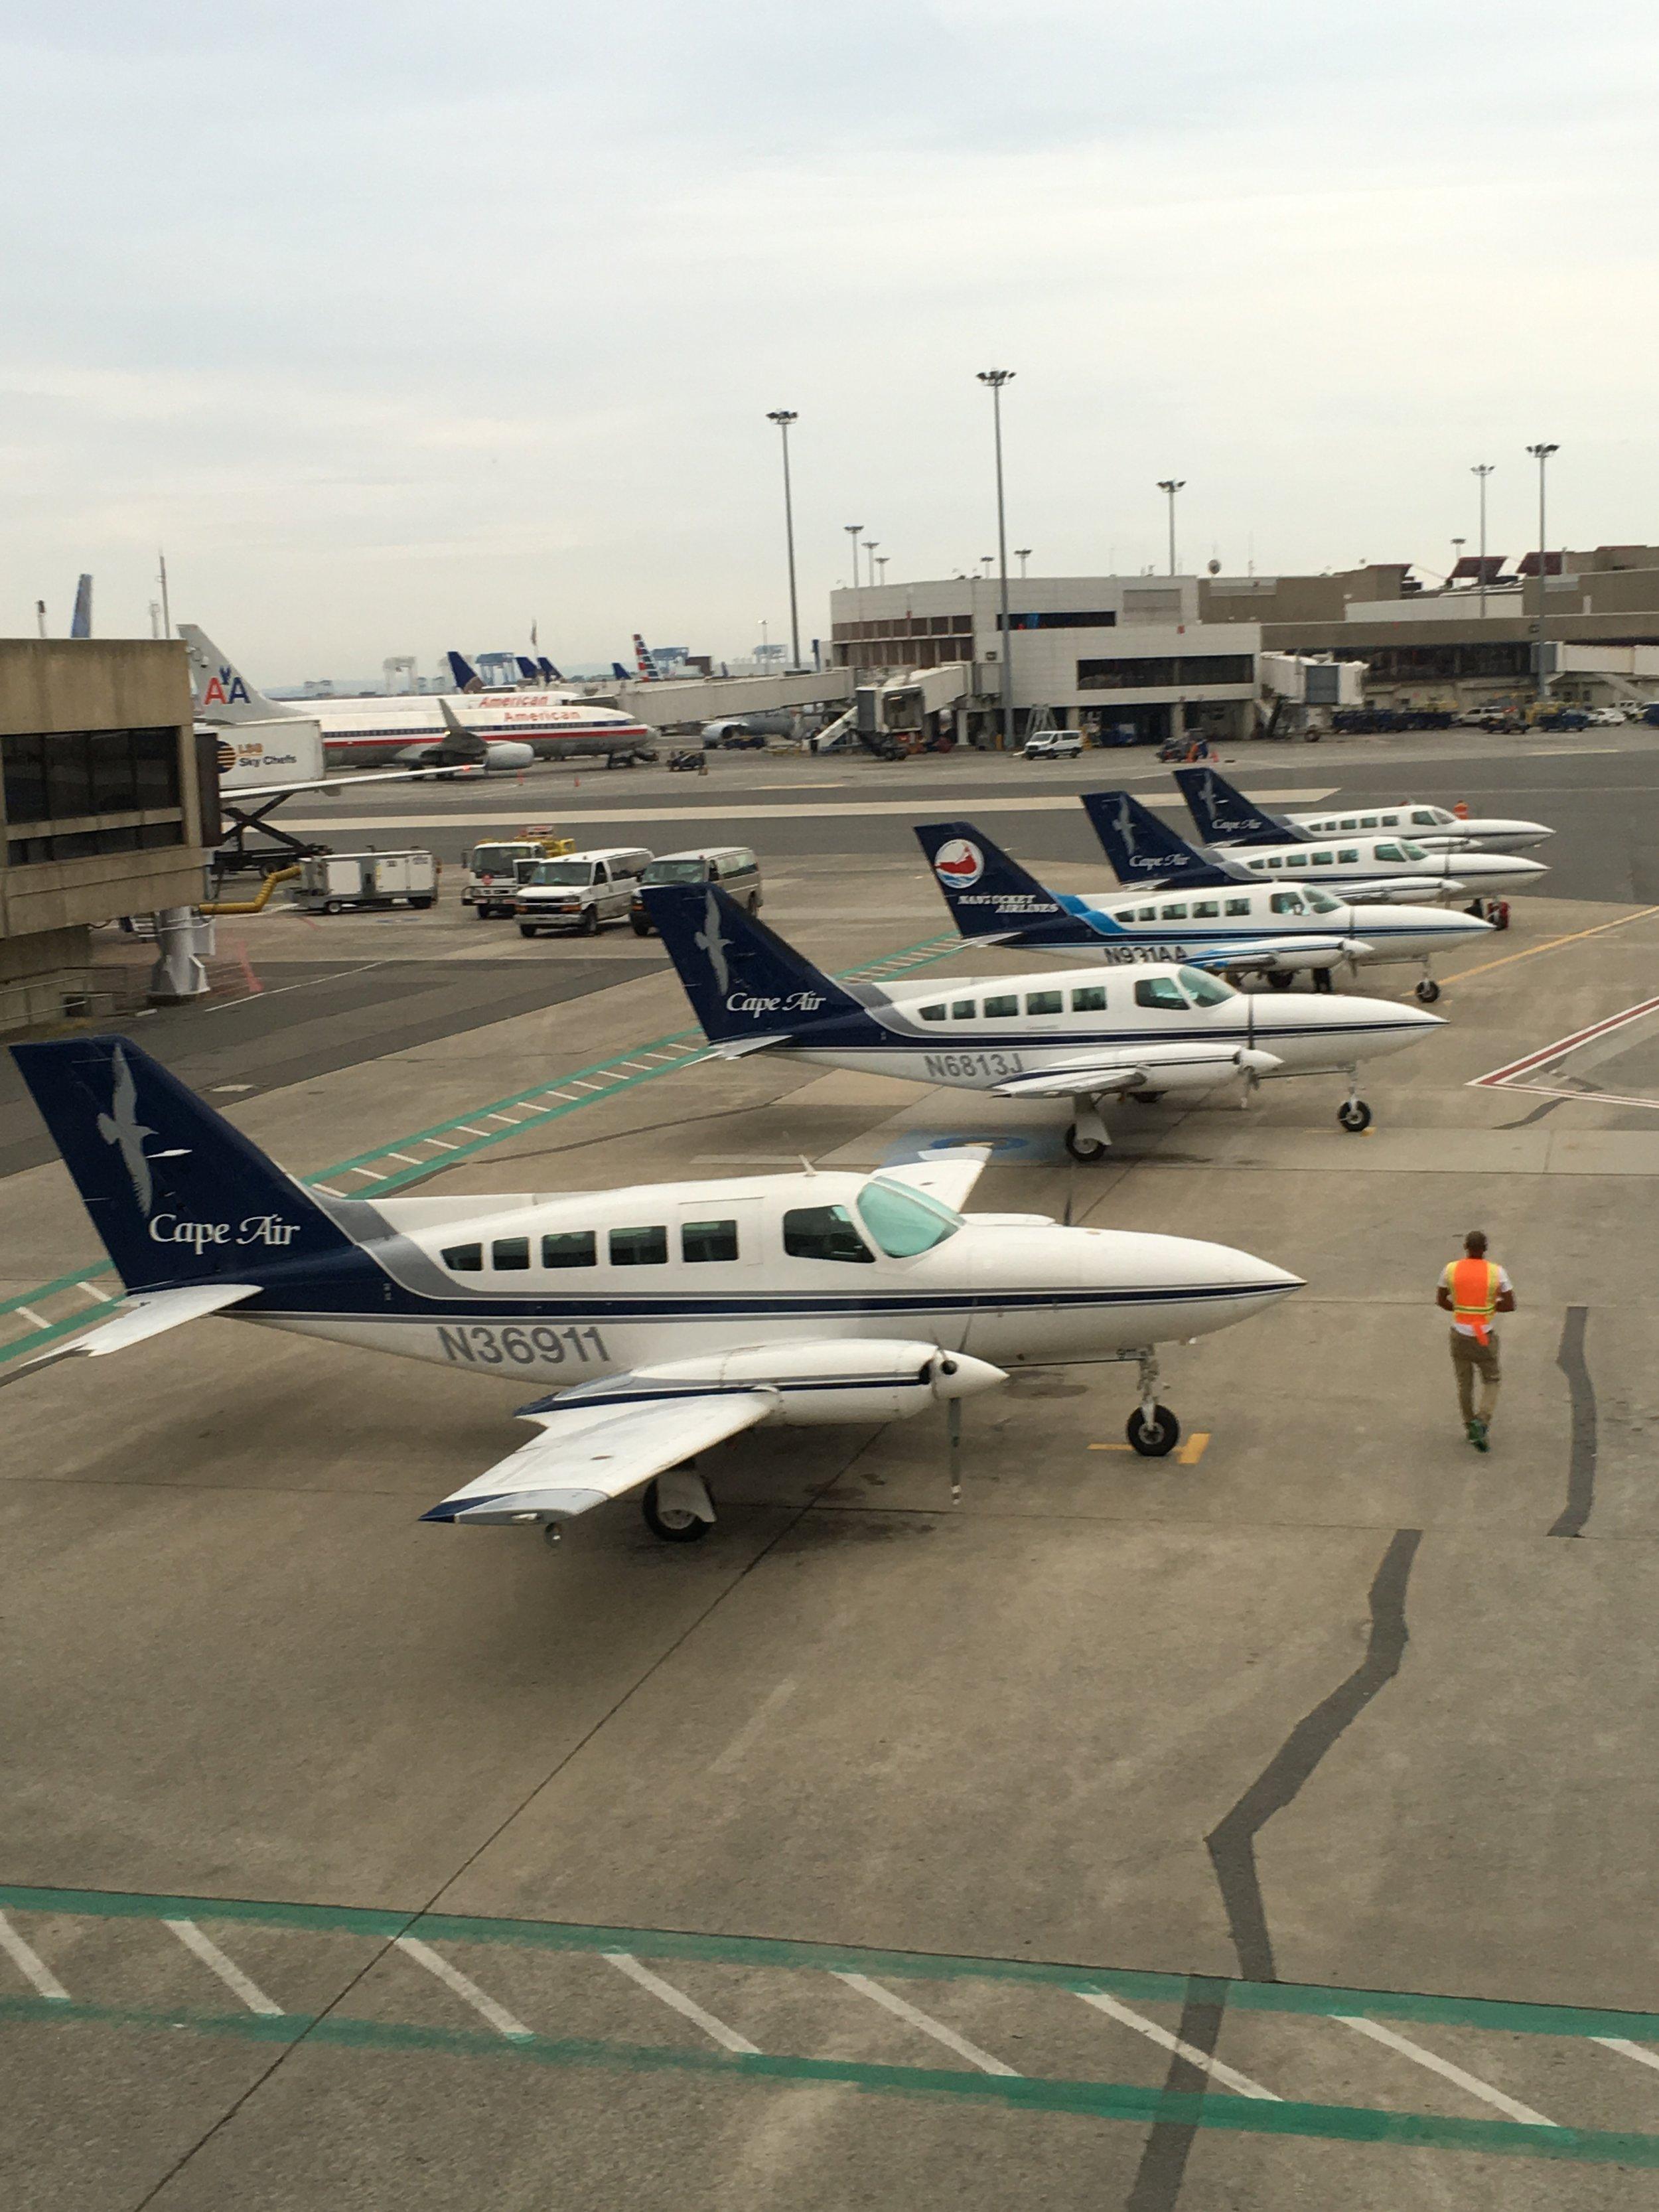 20160909 - Airport Stock - 004.JPG